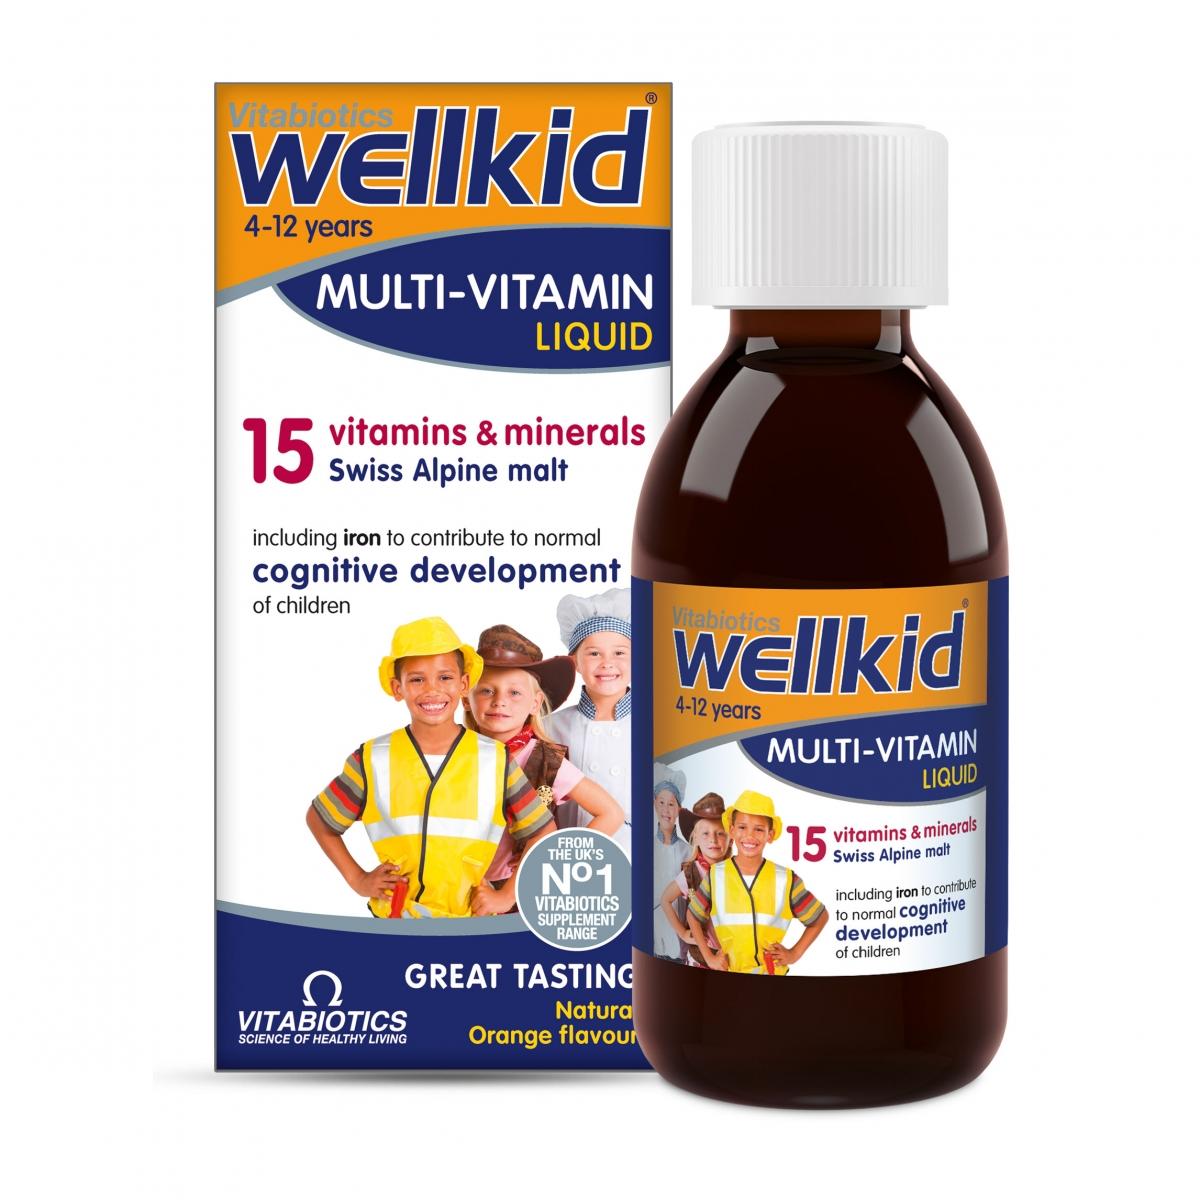 Wellkid Liquid